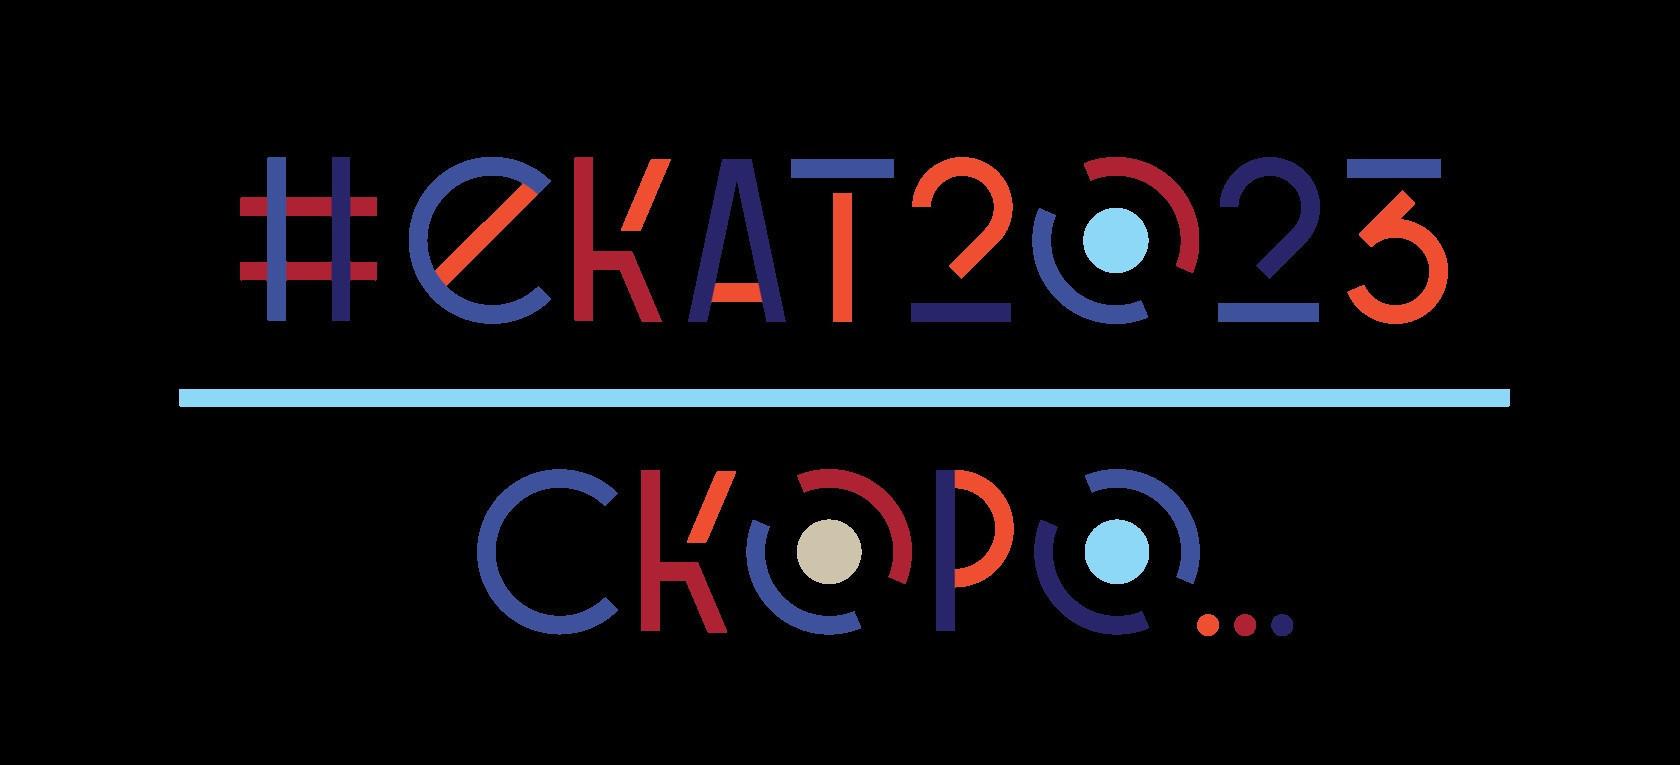 Yekaterinburg 2023 Aquatics Palace given commission date